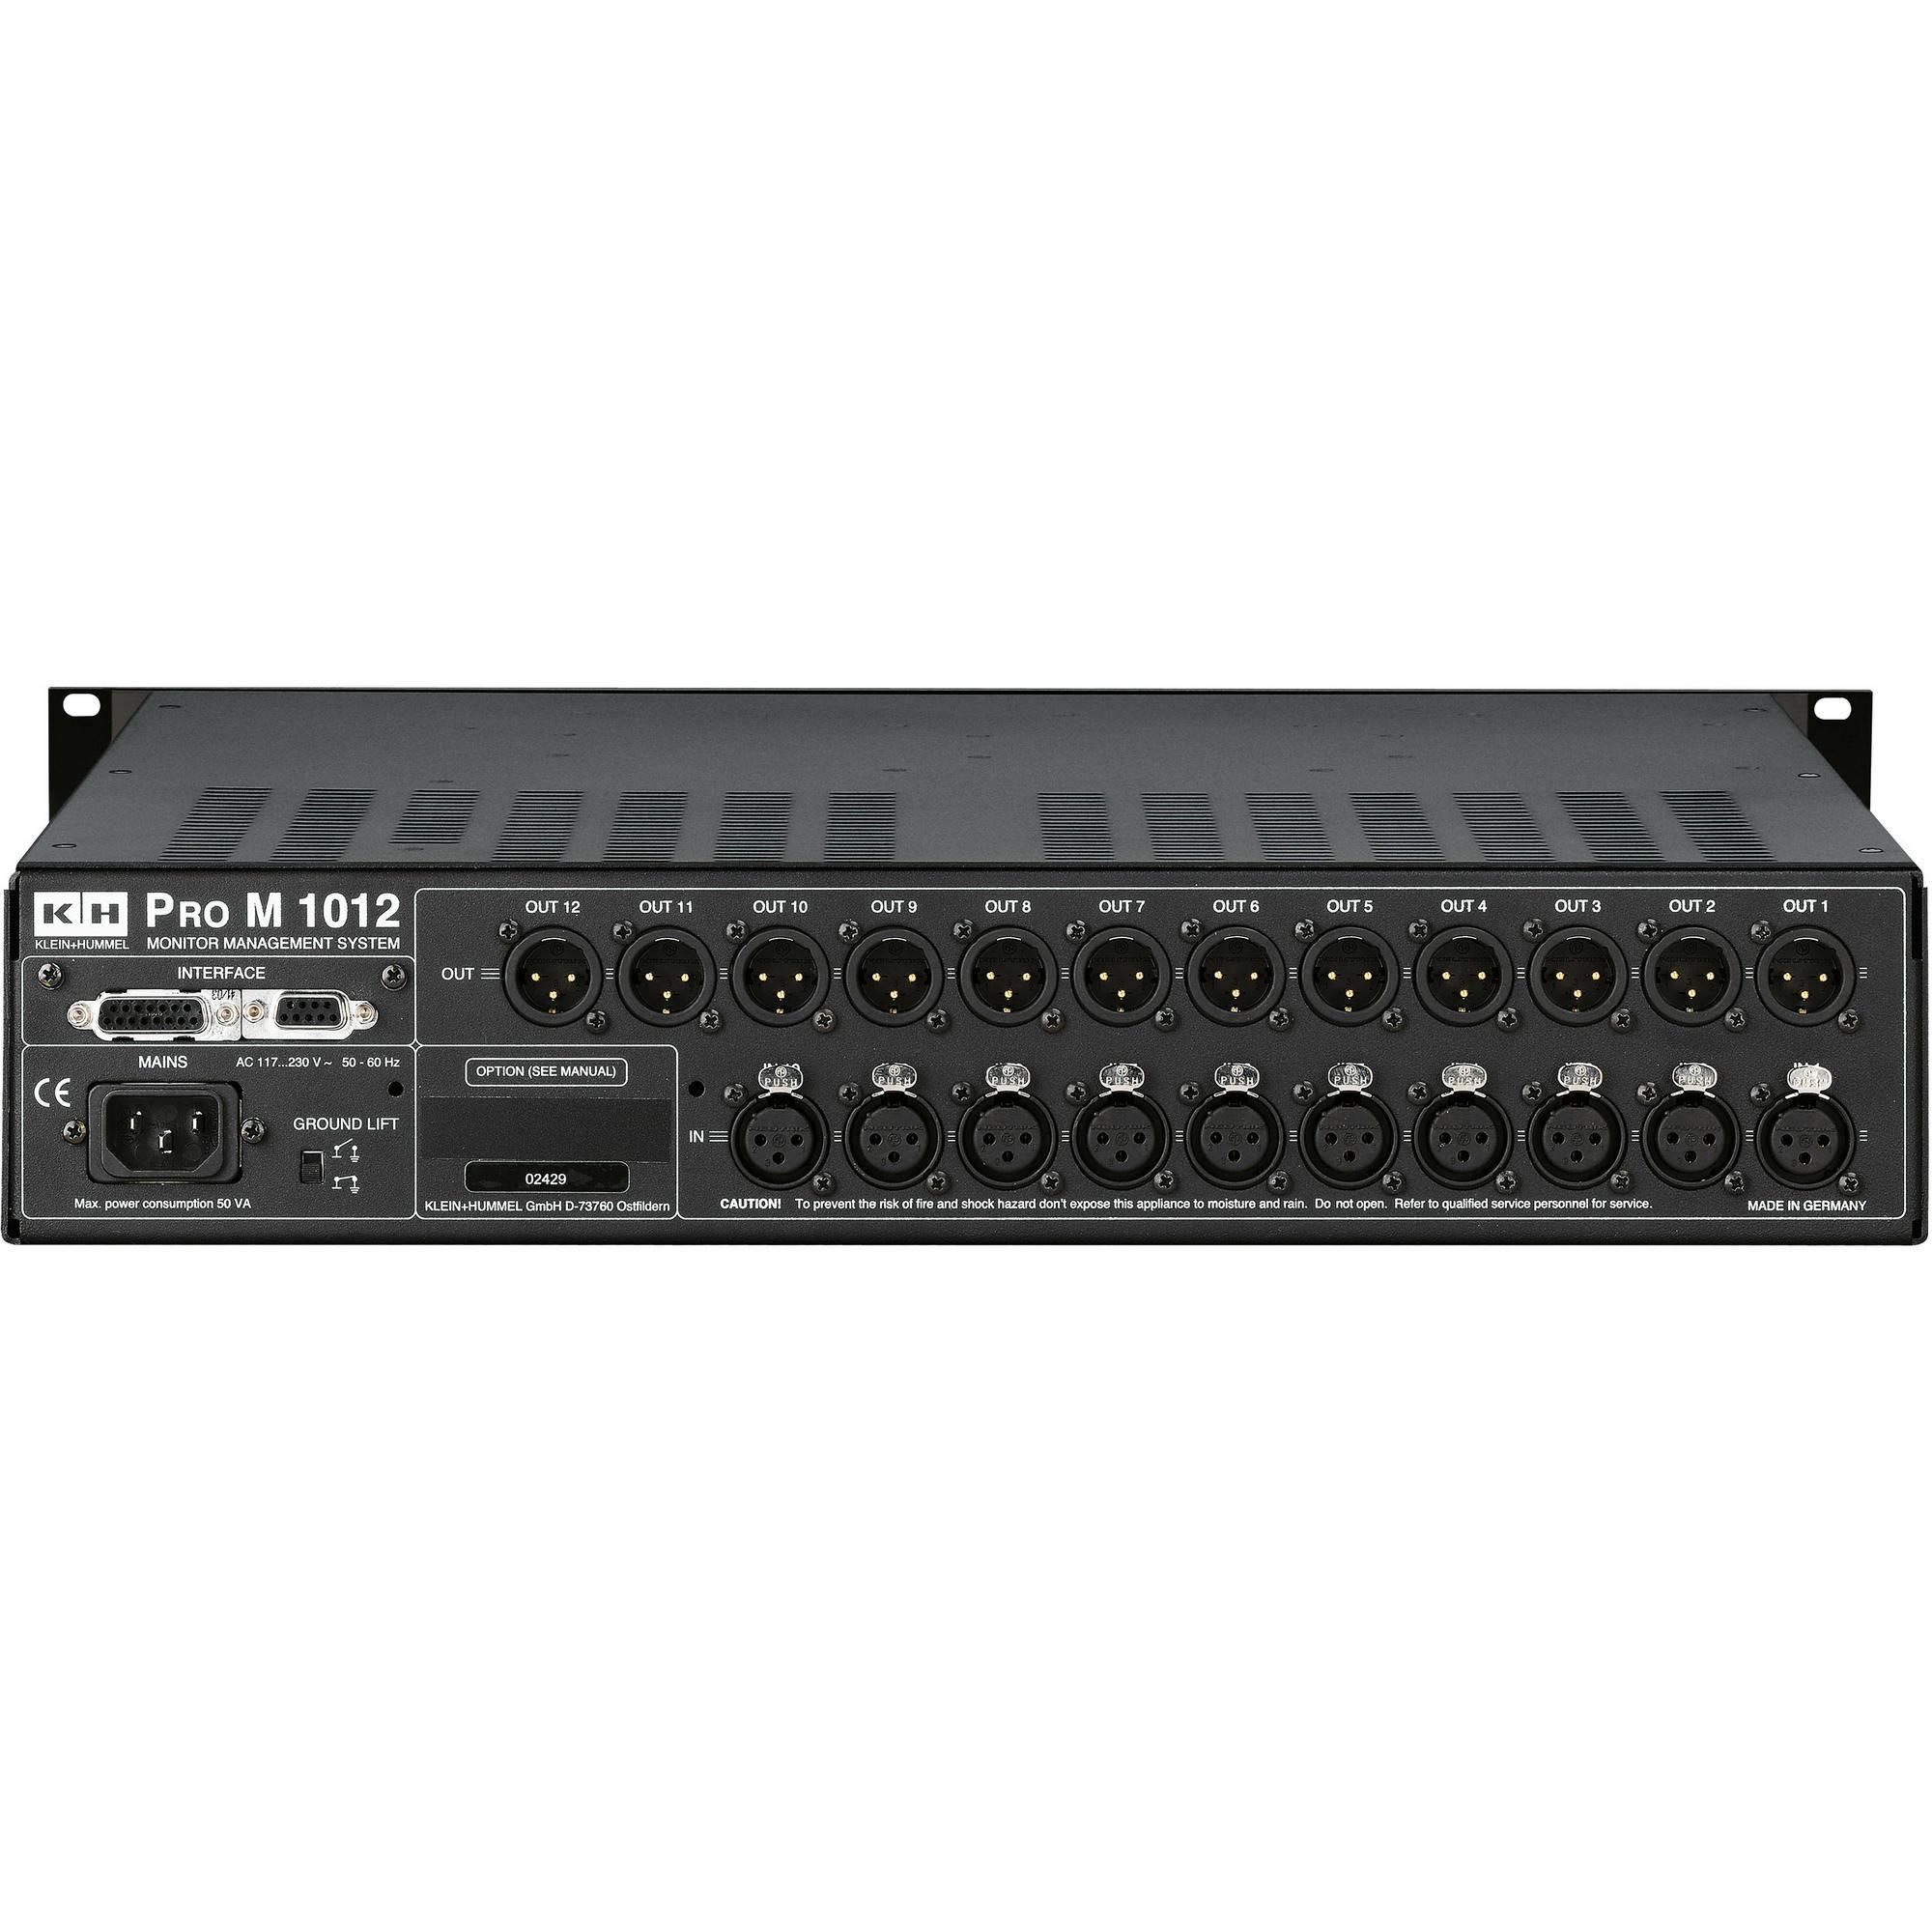 Neumann Pro M 1012 Monitor Management System